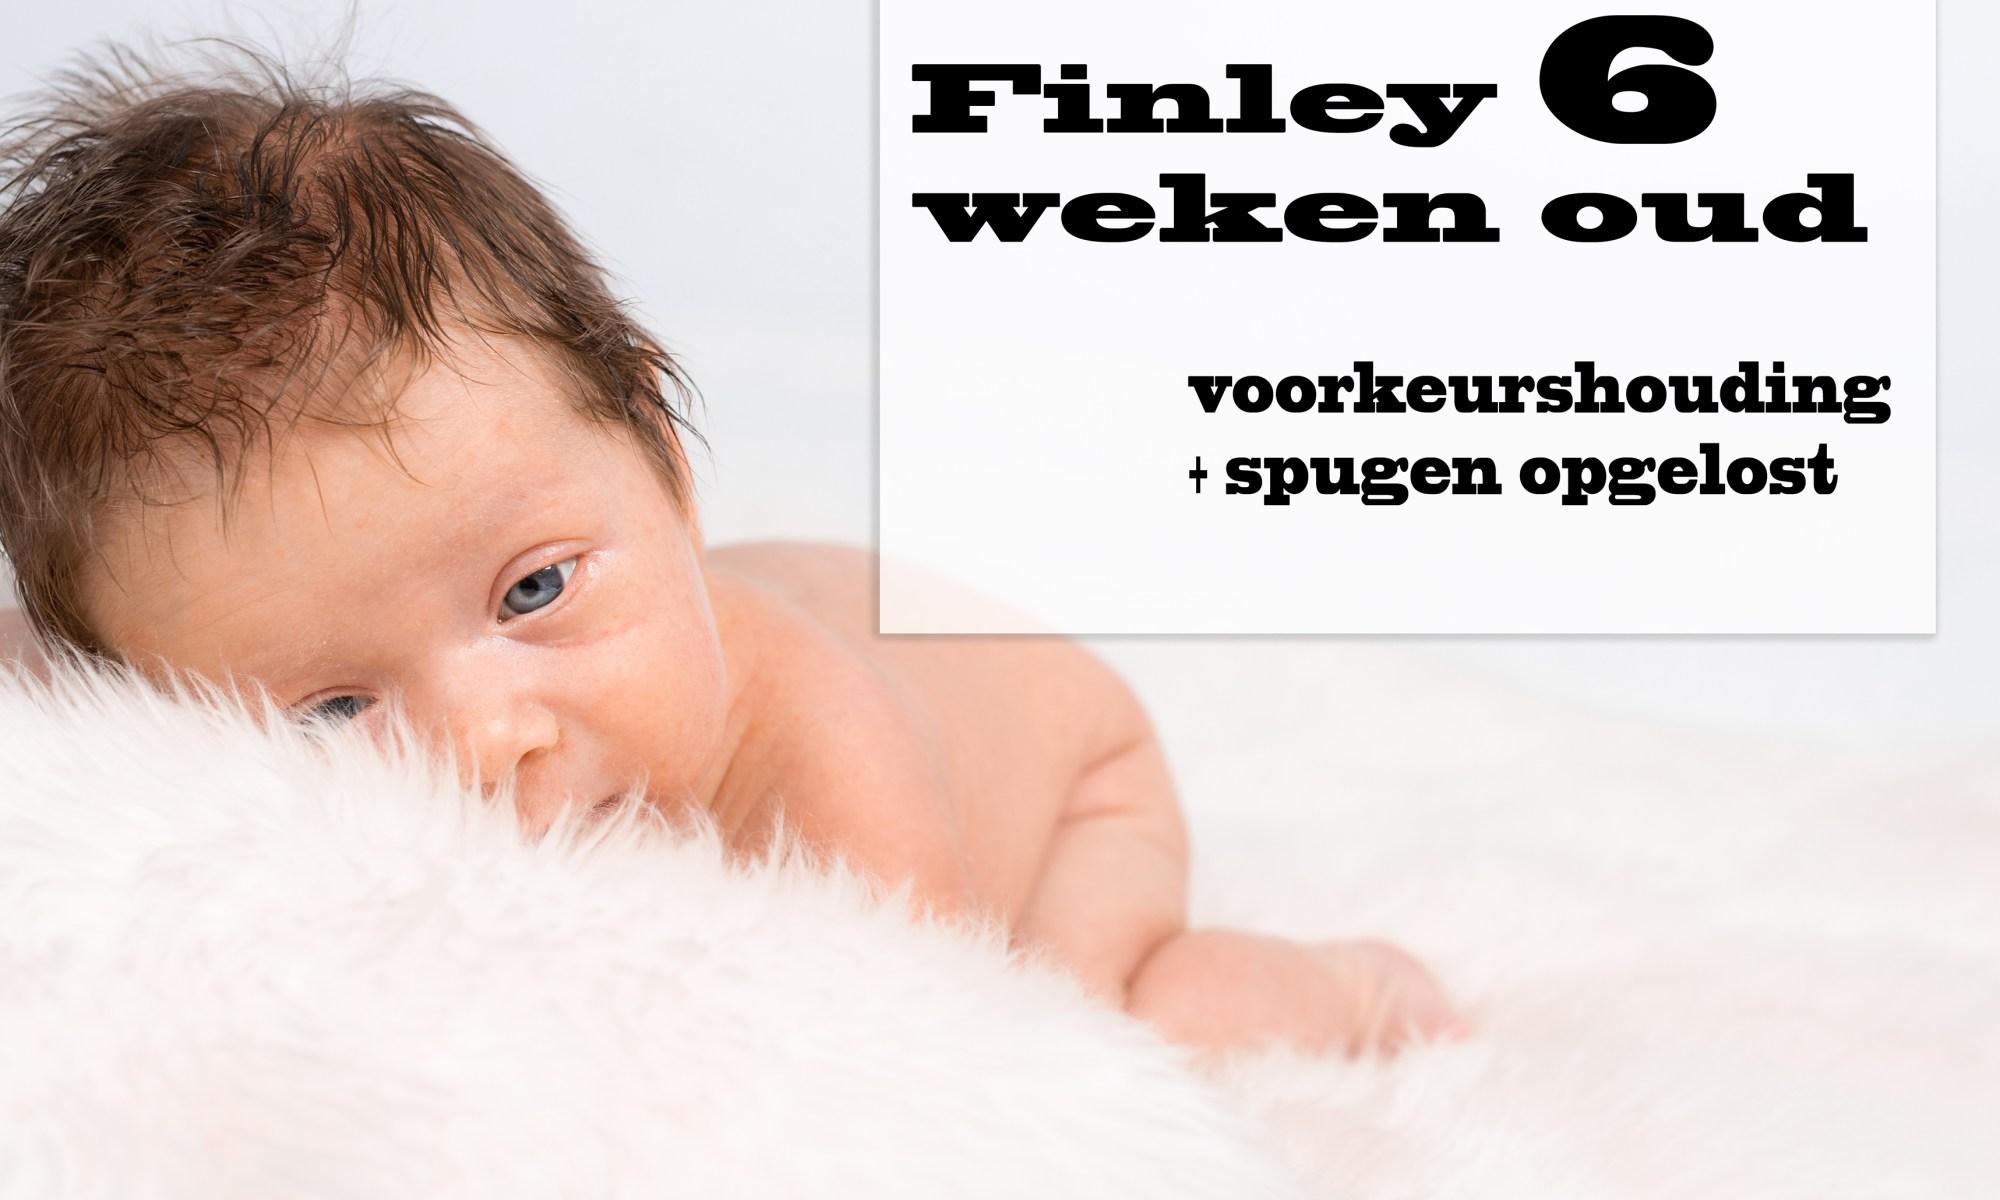 Finley 6 weken oud baby newborn borstvoeding mama pasgeboren mama blog foto shoot www.liefkleiwonder.nl Slaapzak voorkeurshouding spugen borstvoeding toeschietreflex druk nek spieren